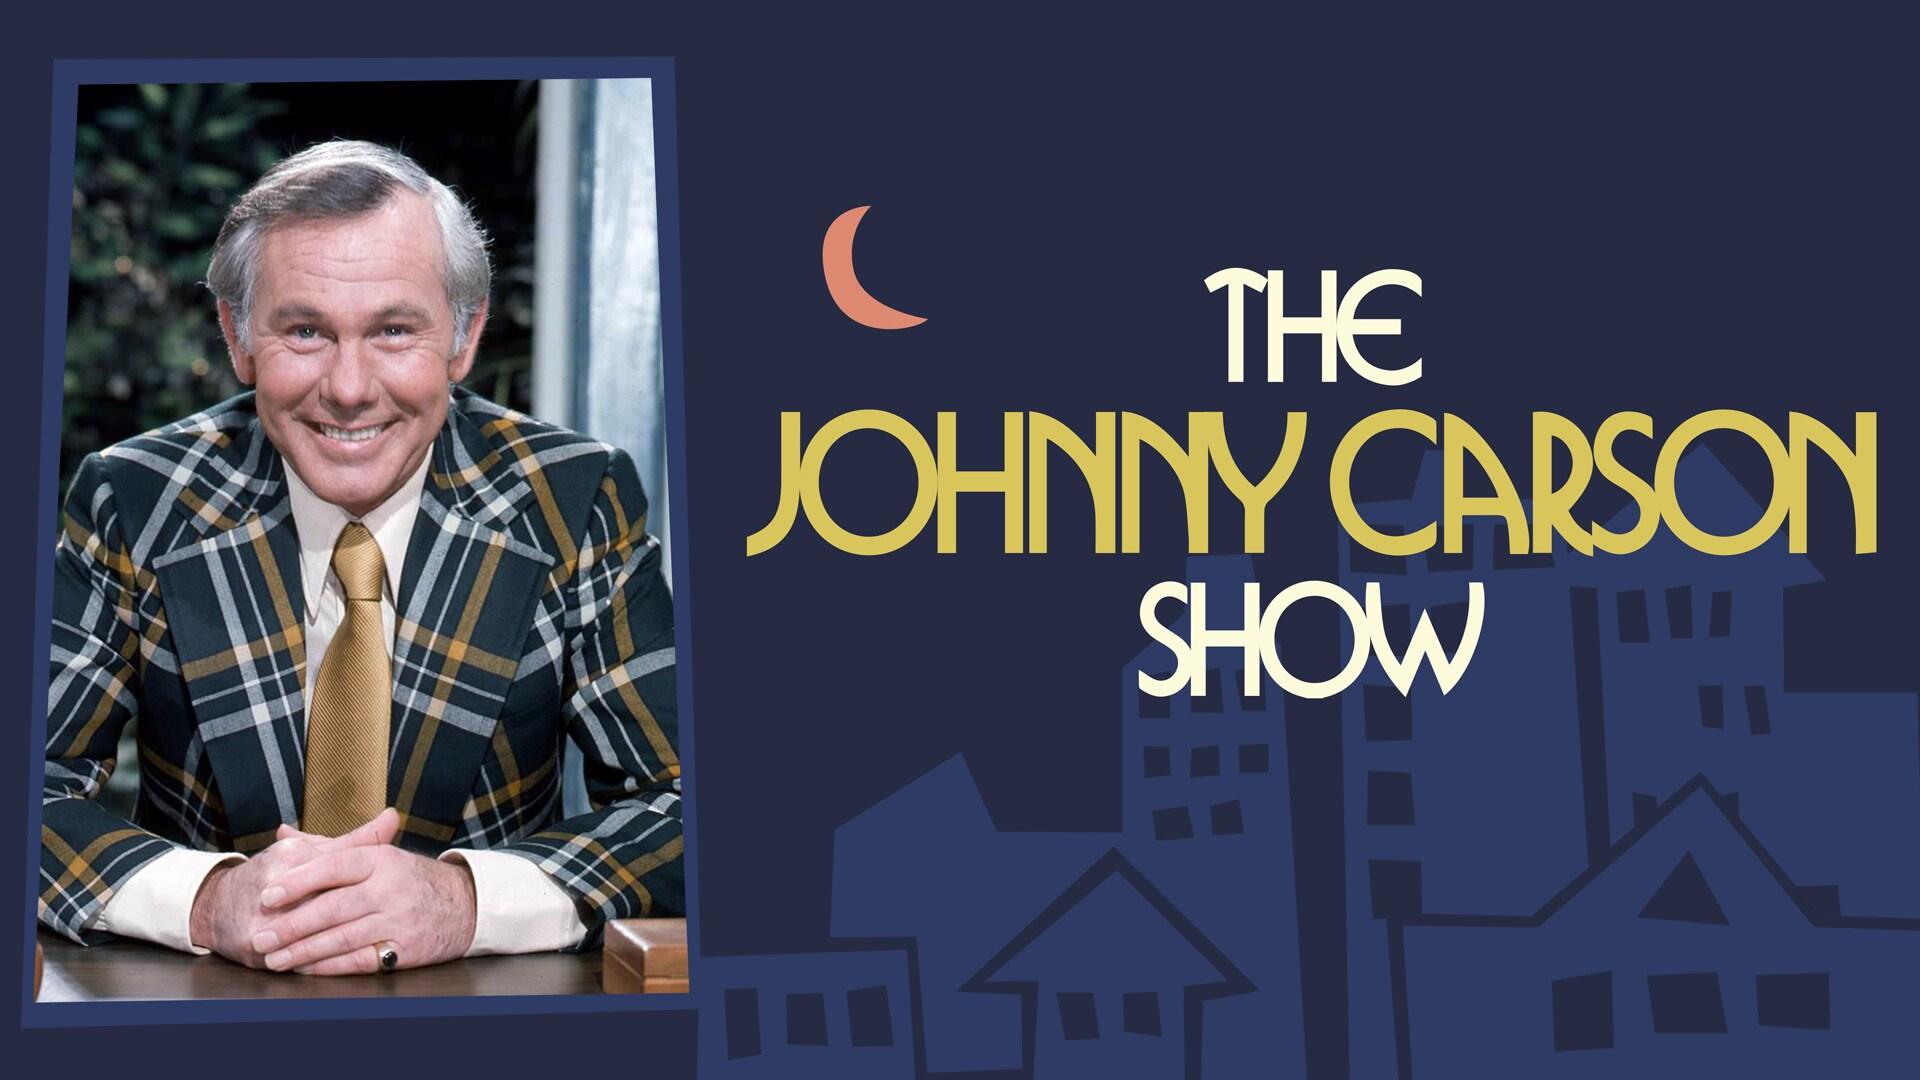 The Johnny Carson Show: Animal Antics With Joan Embery (6/26/86)